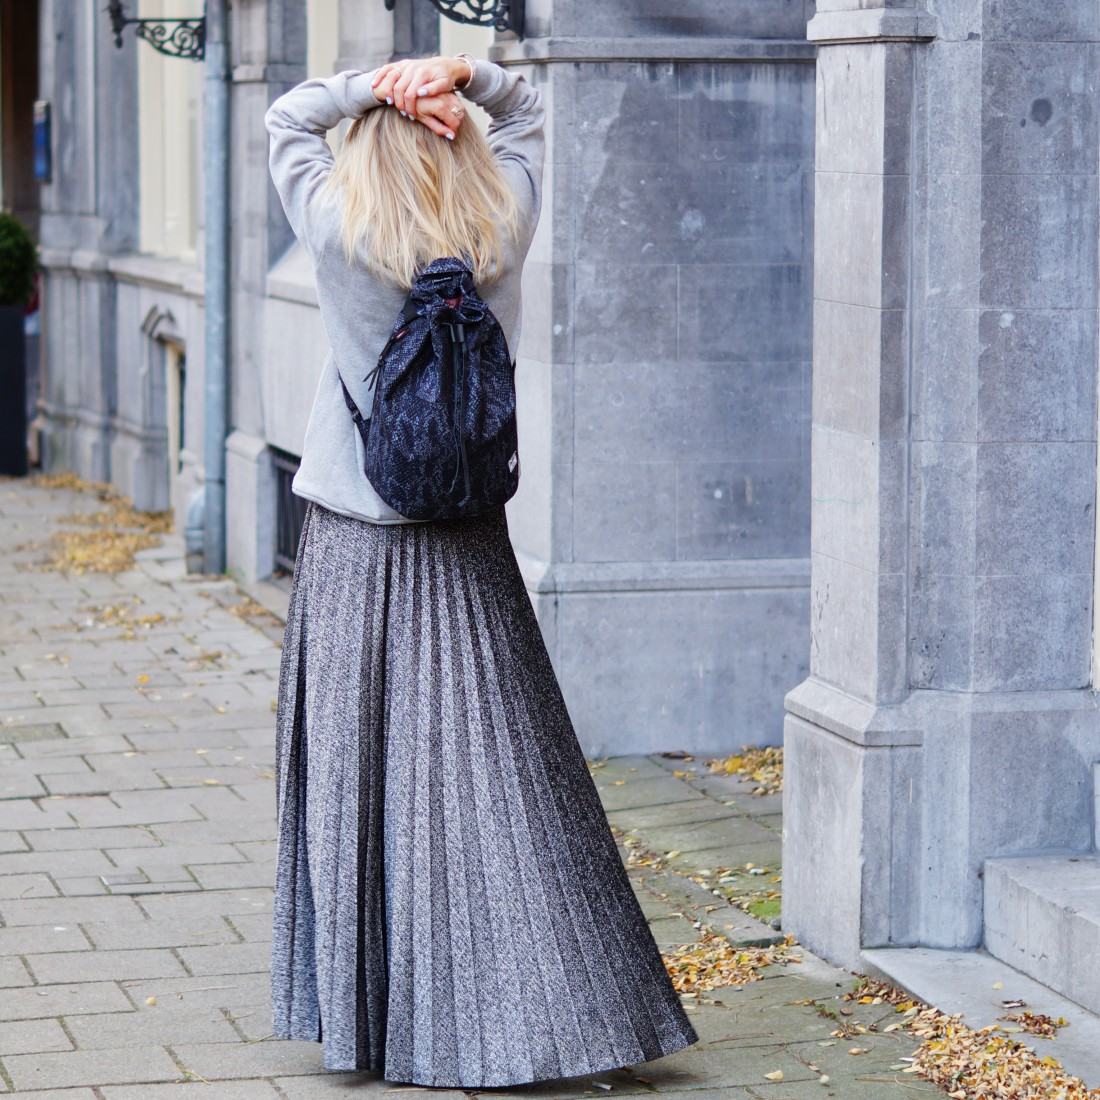 Bag at You - Fashion blog - Silver skirt and Herschel Backpack